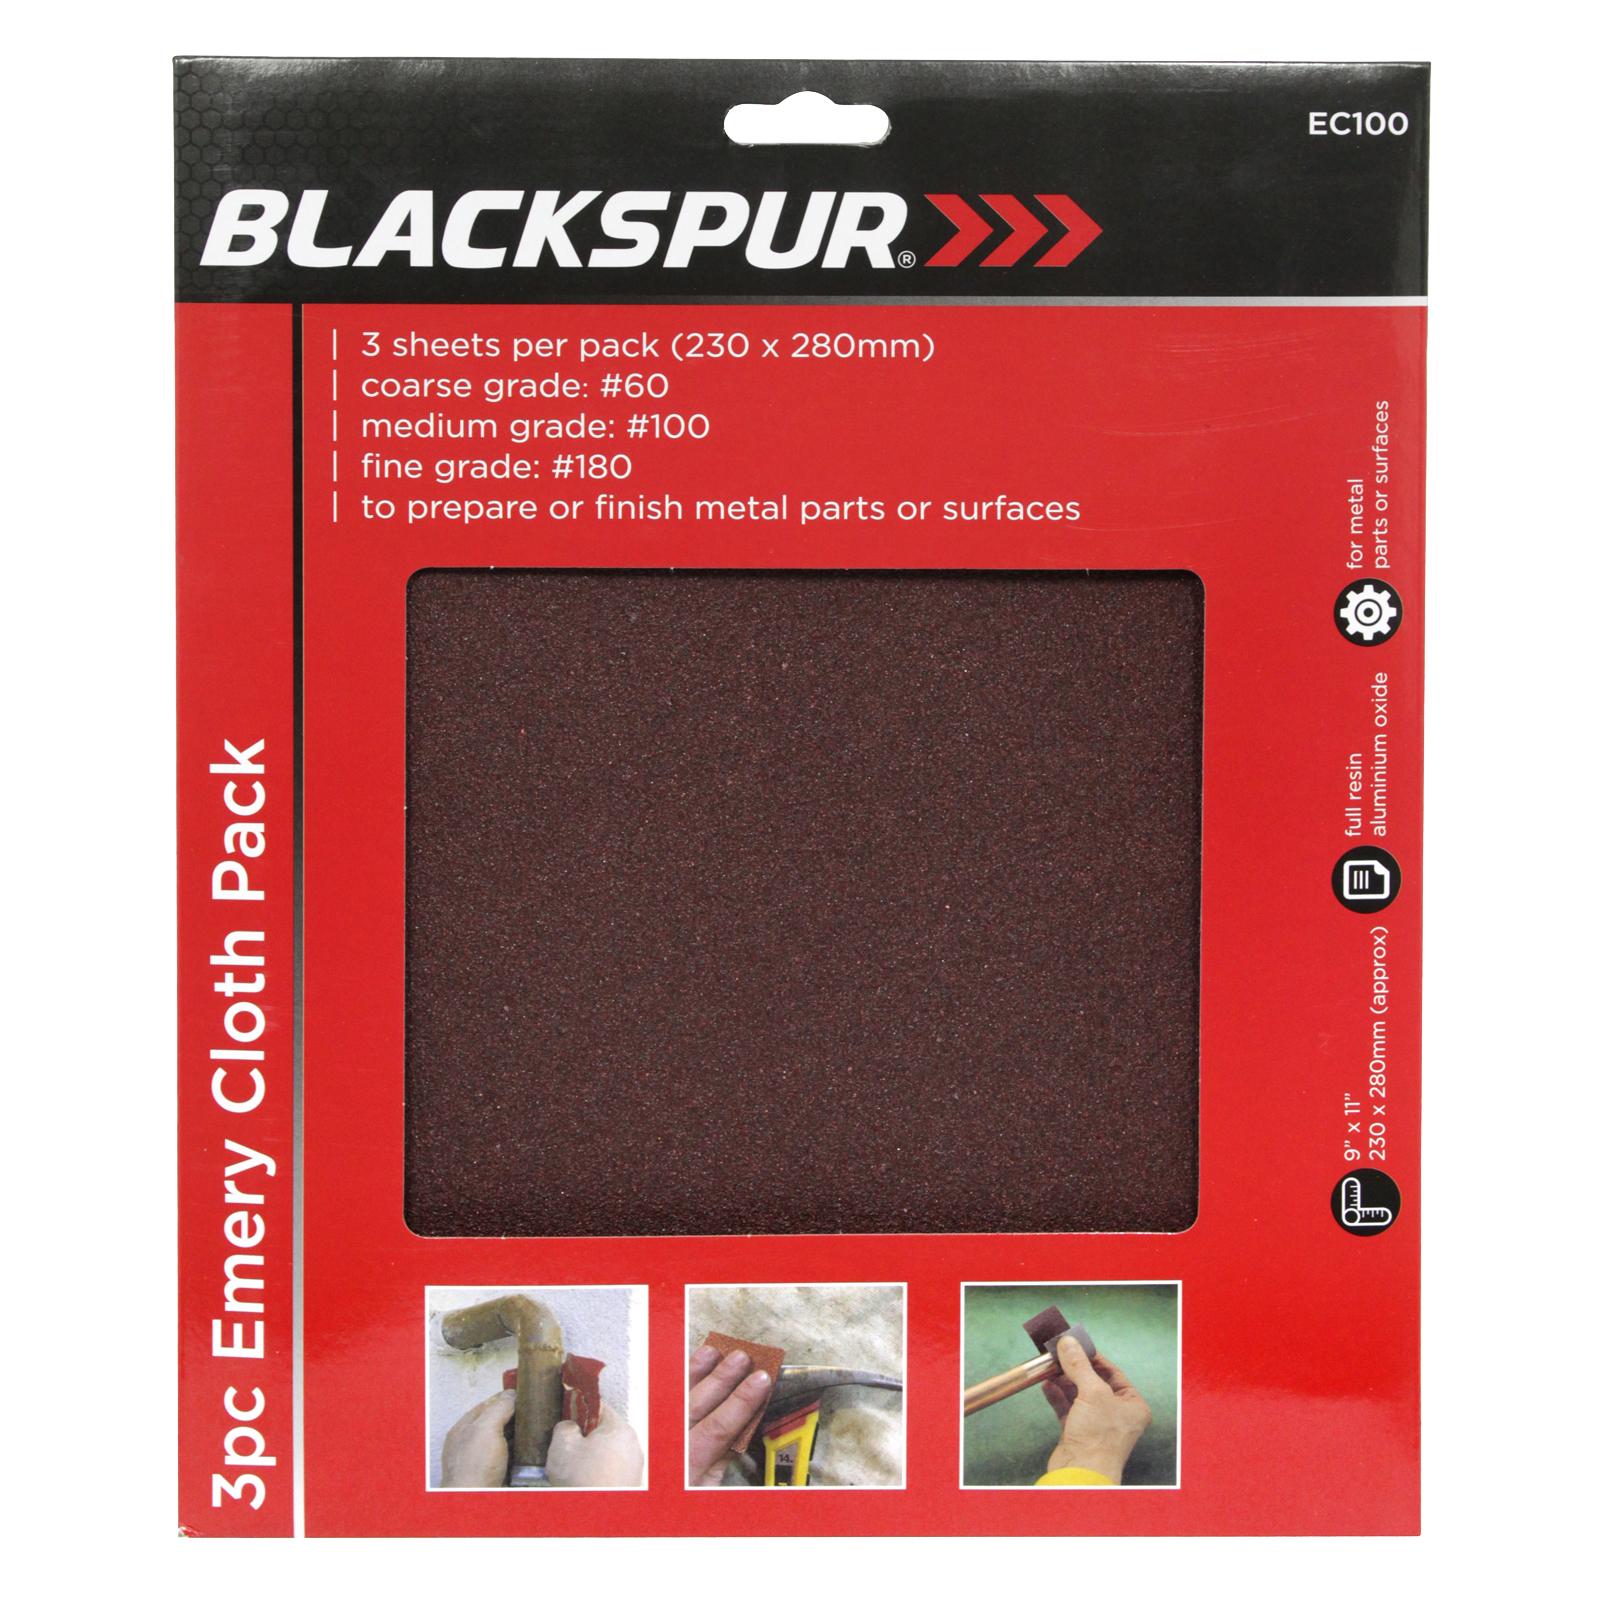 BLACKSPUR 3PC EMERY CLOTH 230X280MM